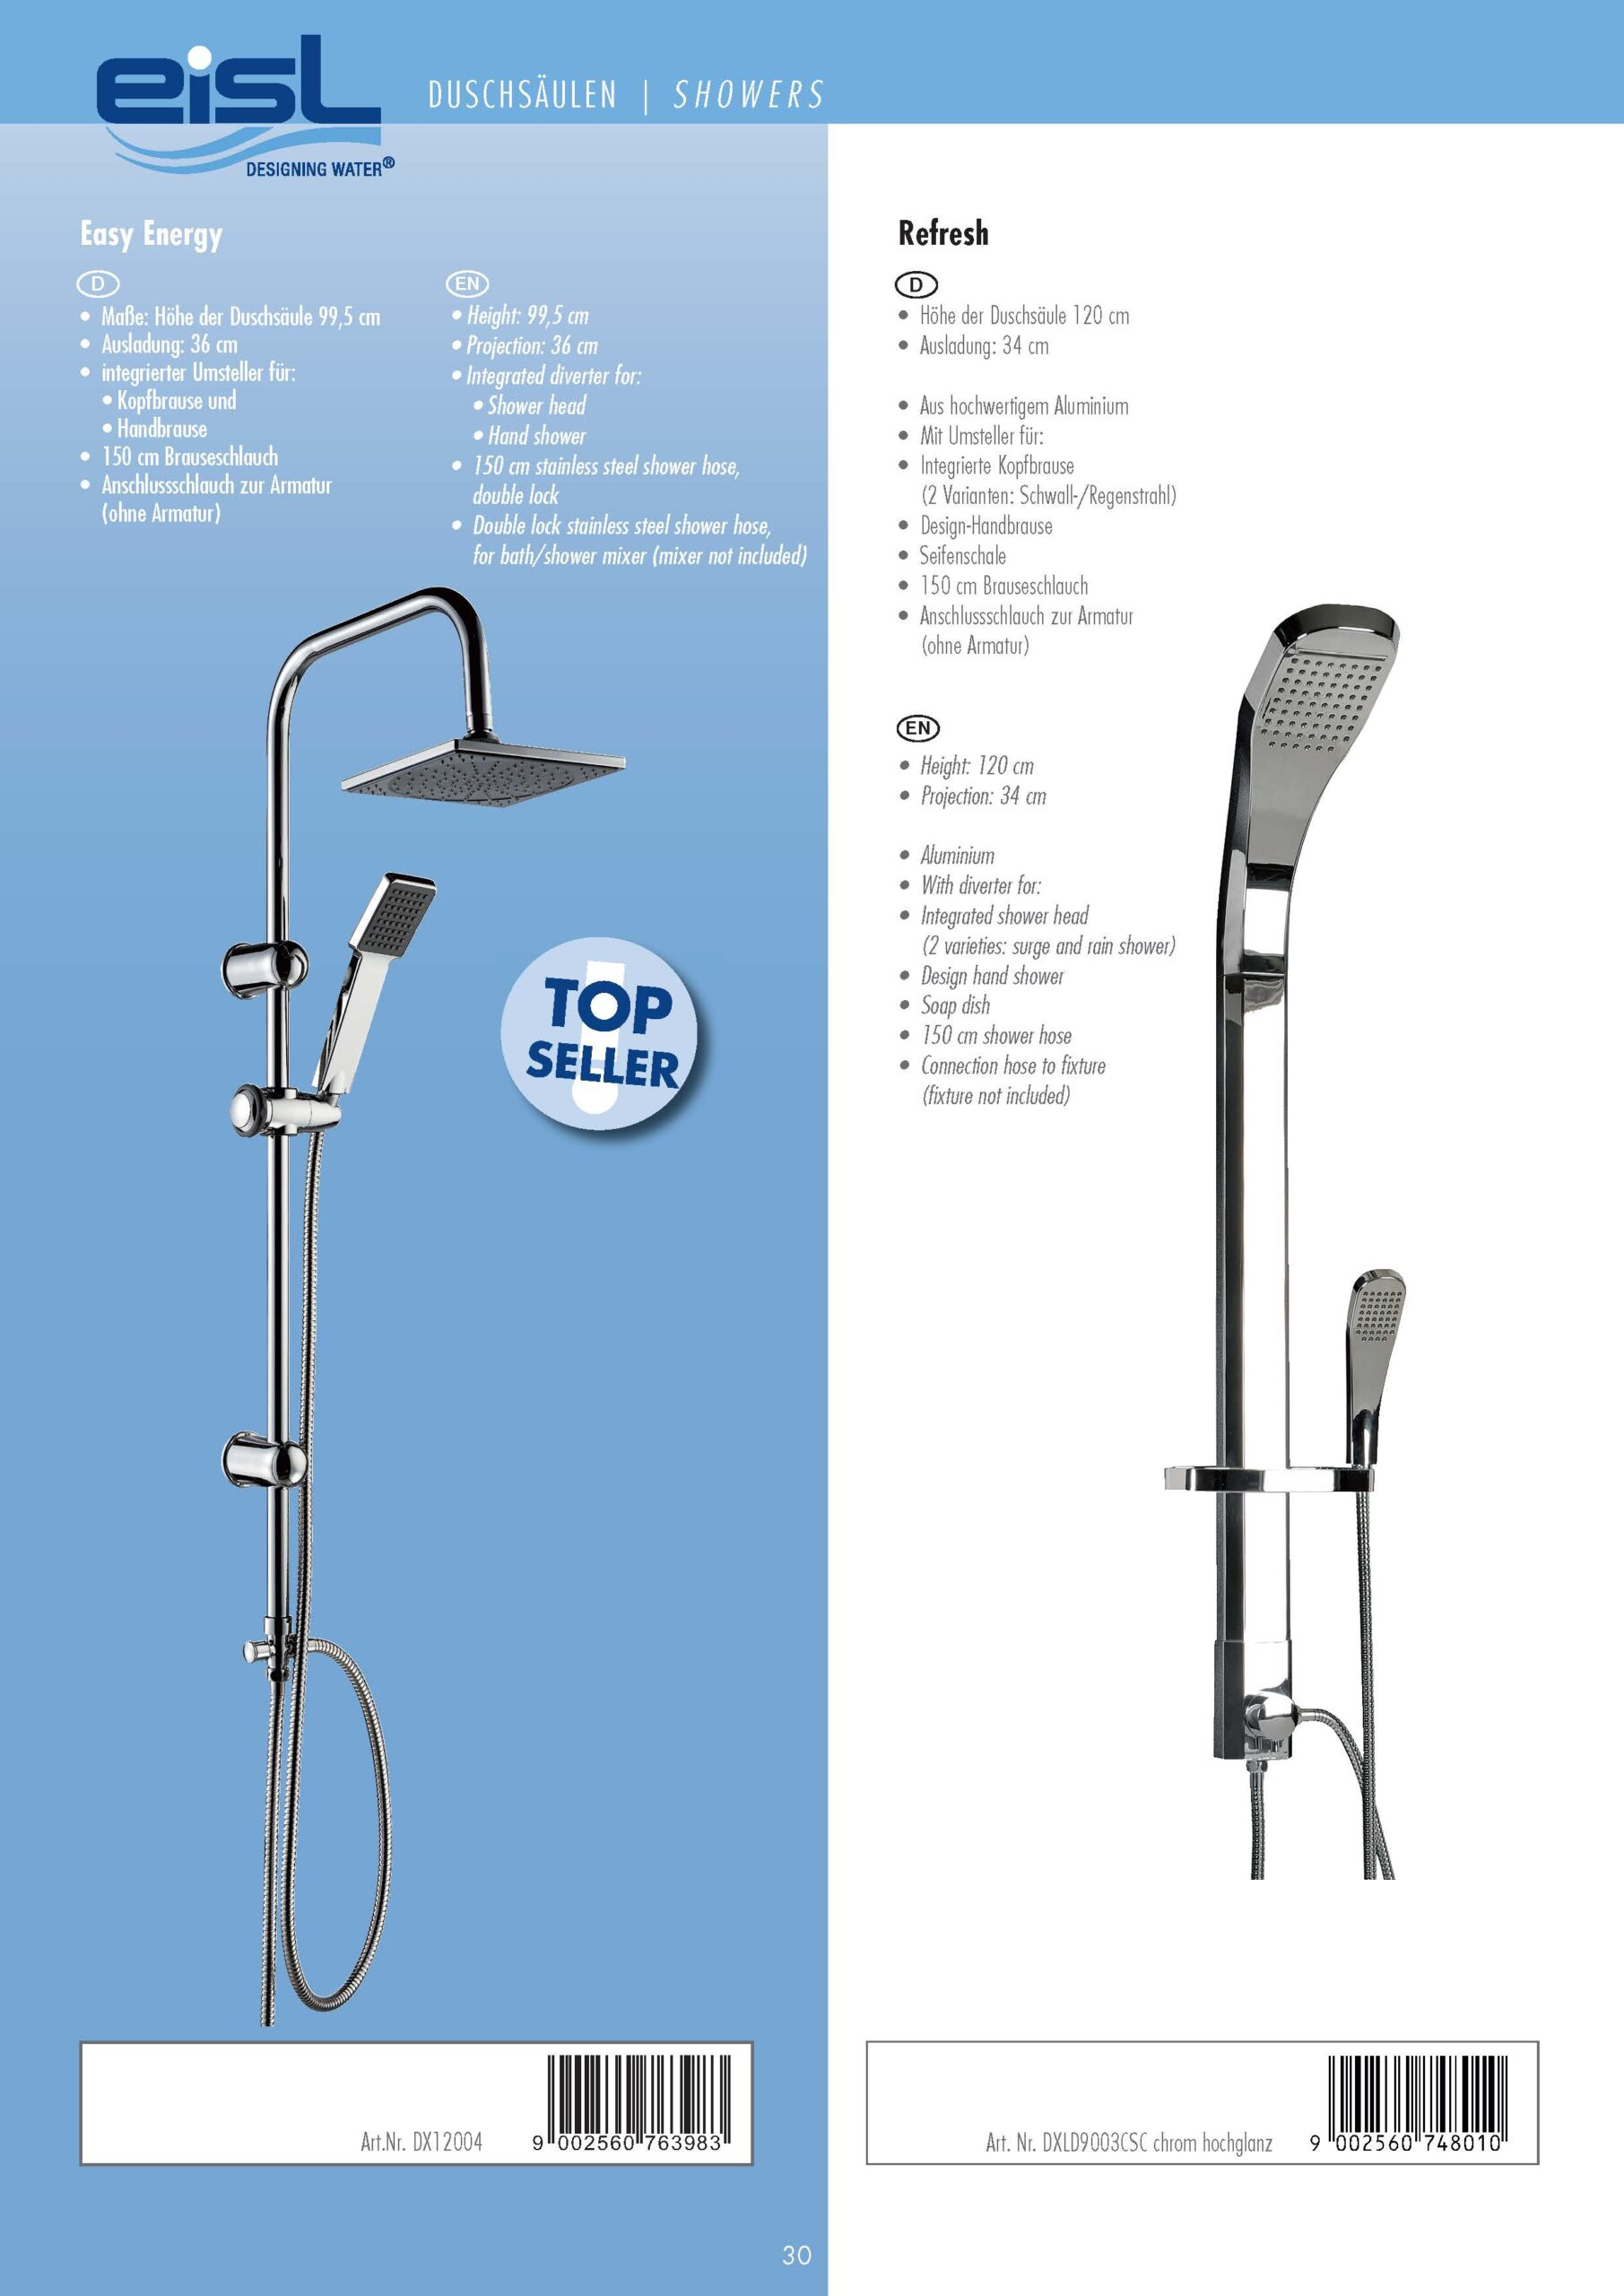 Full Size of Eisl Designing Water Katalog Duschsäulen Dusche Duschsäulen